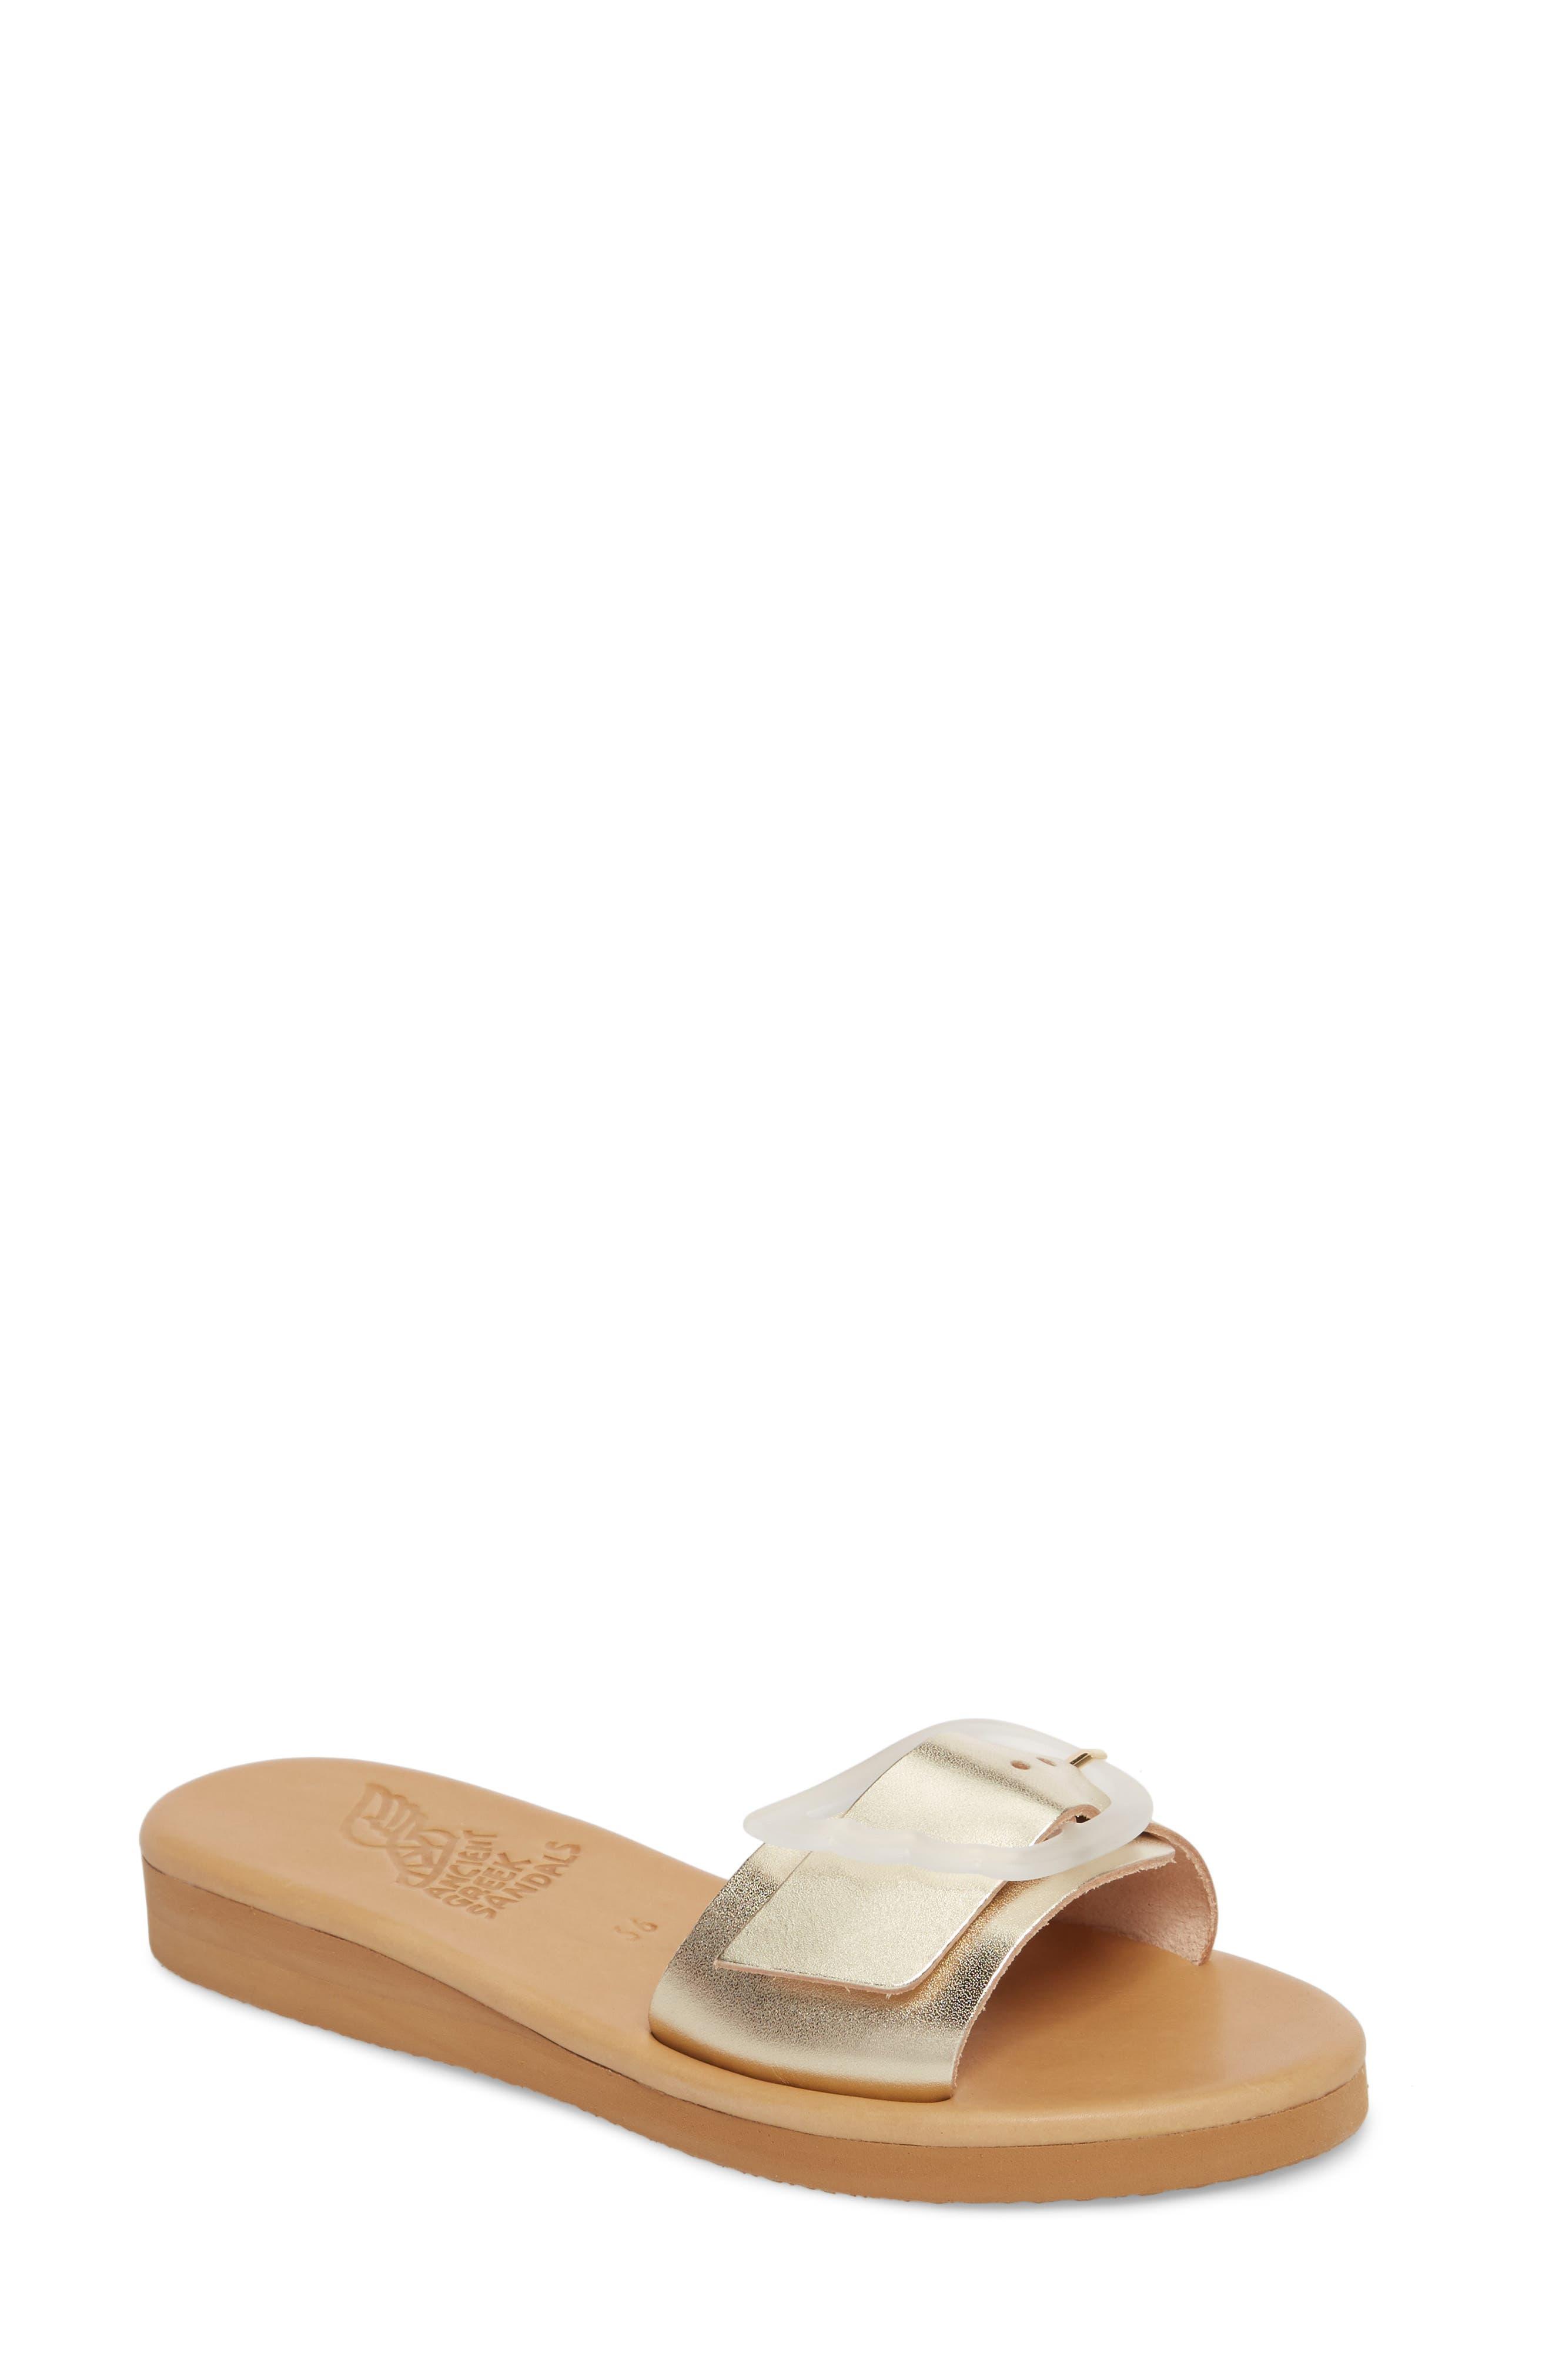 Aglaia Slide Sandal,                         Main,                         color, PLATINUM